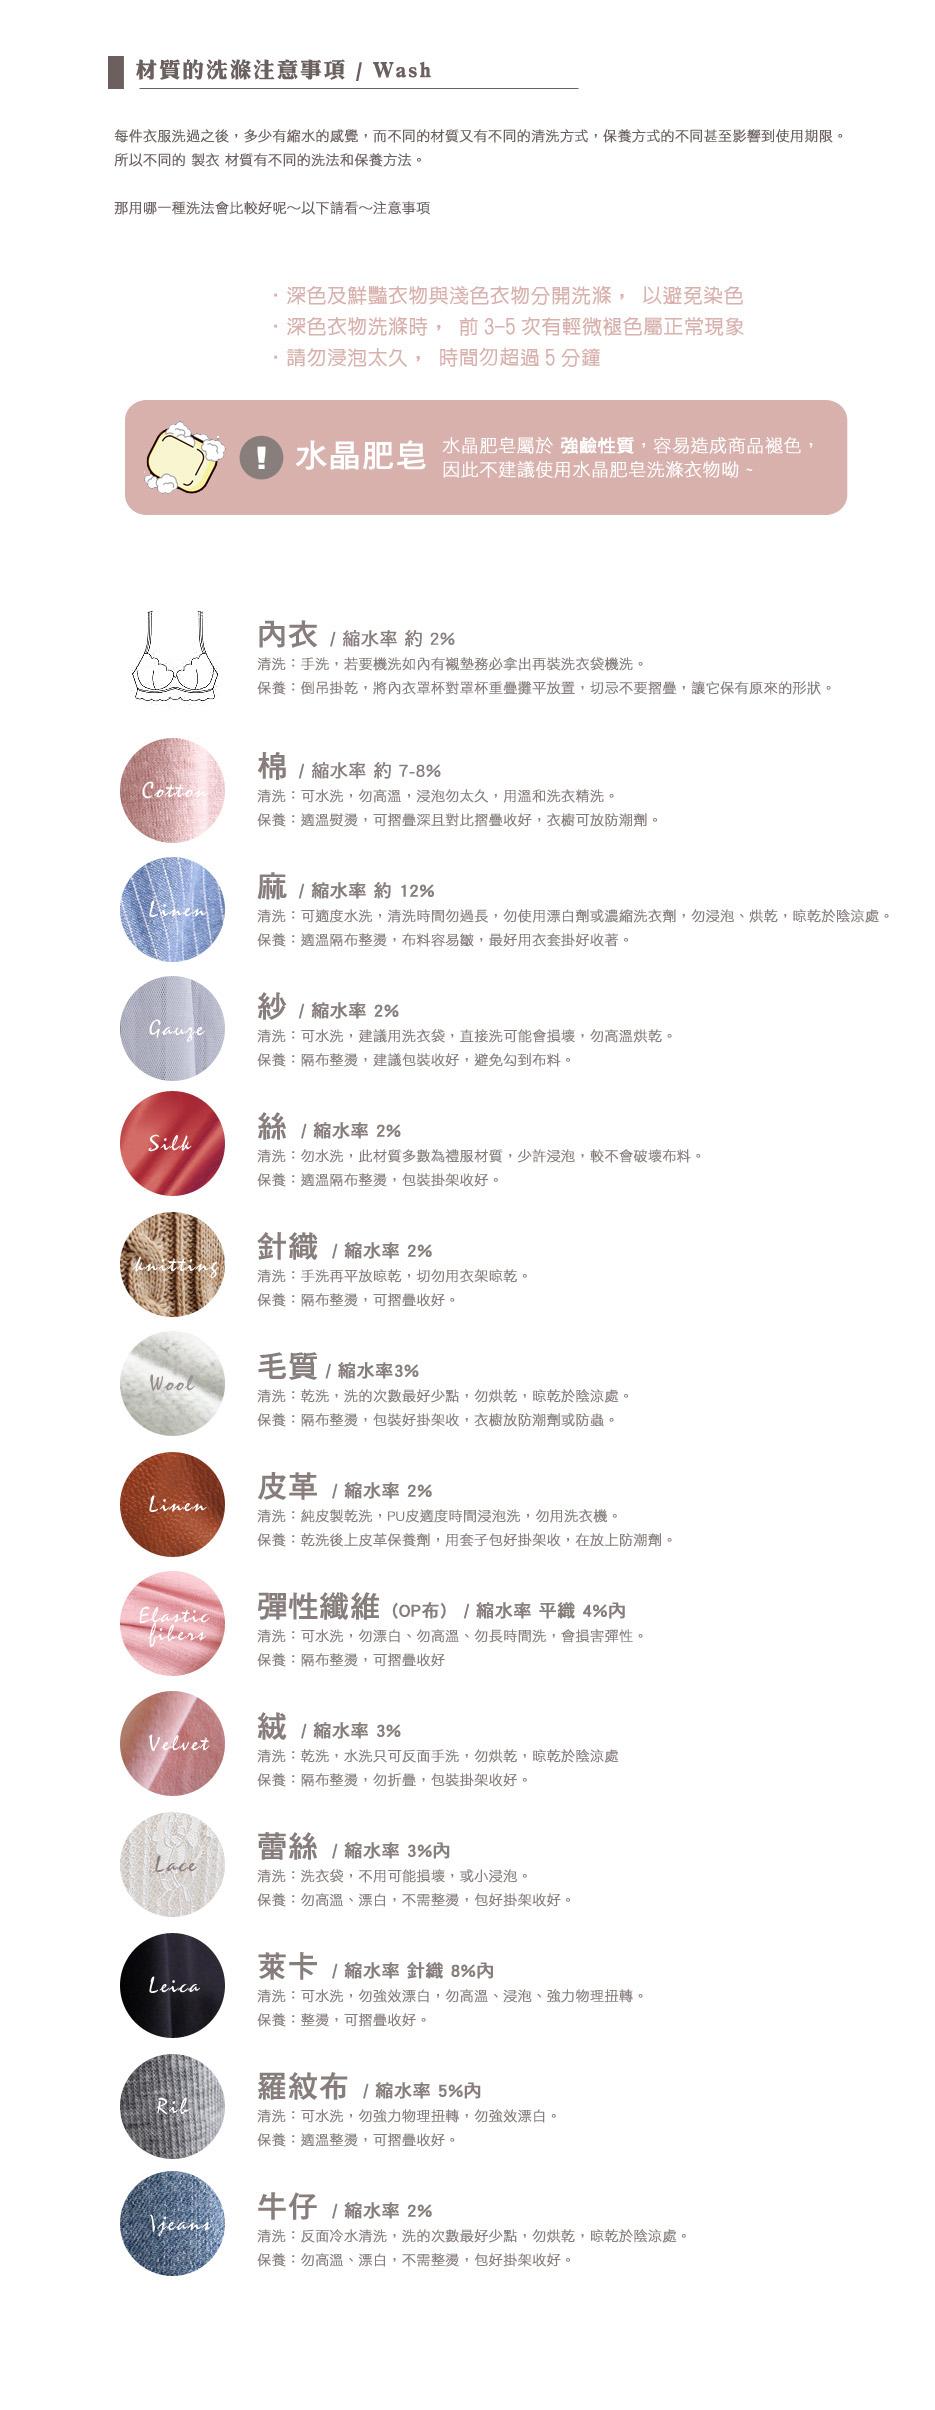 https://www.hahan888.com/ying/qa/company.jpg